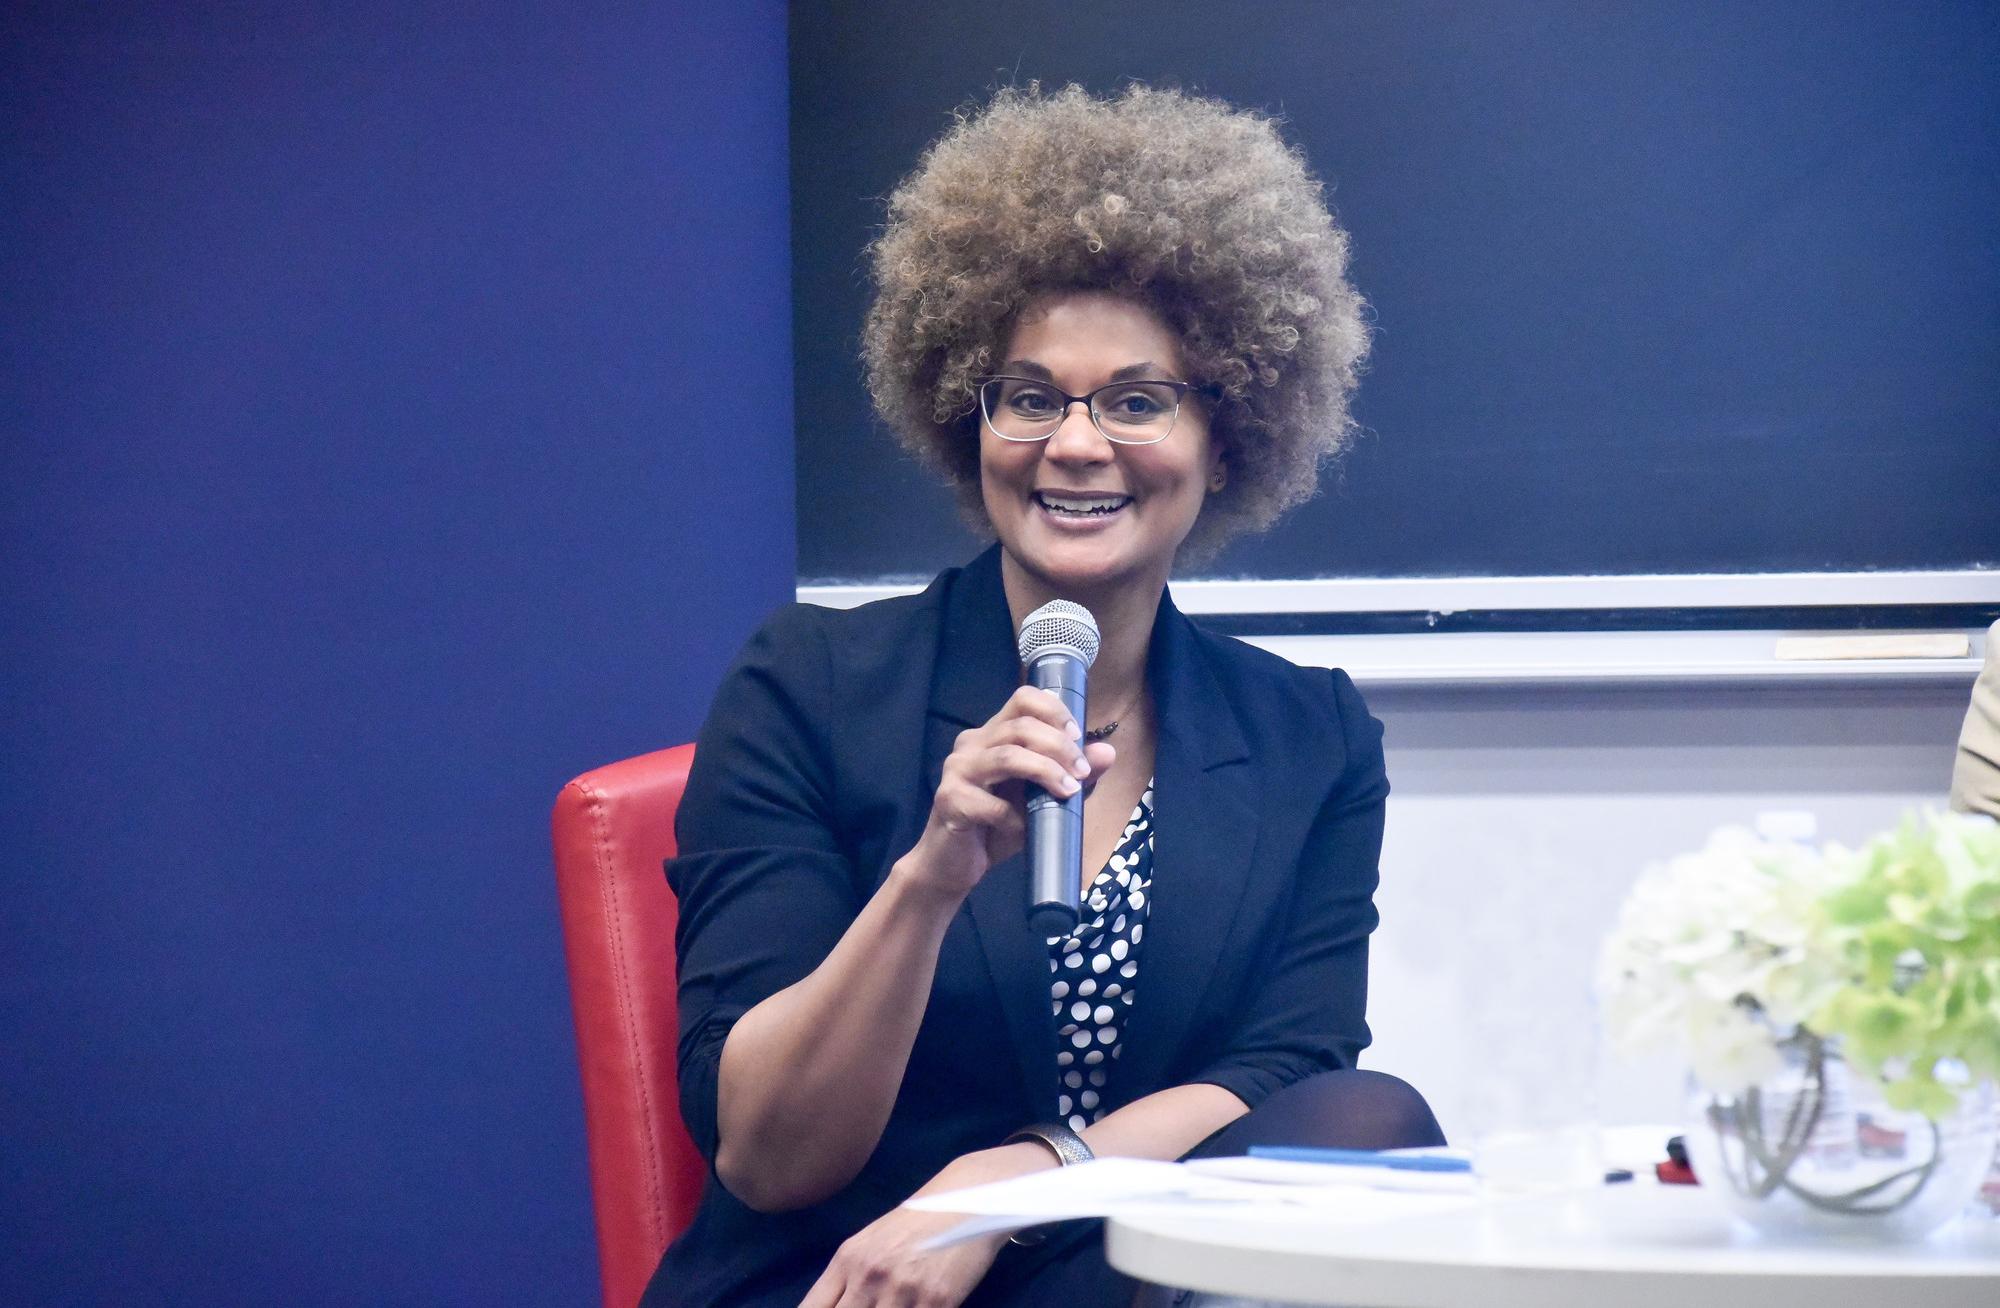 Professor Maydianne Andrade